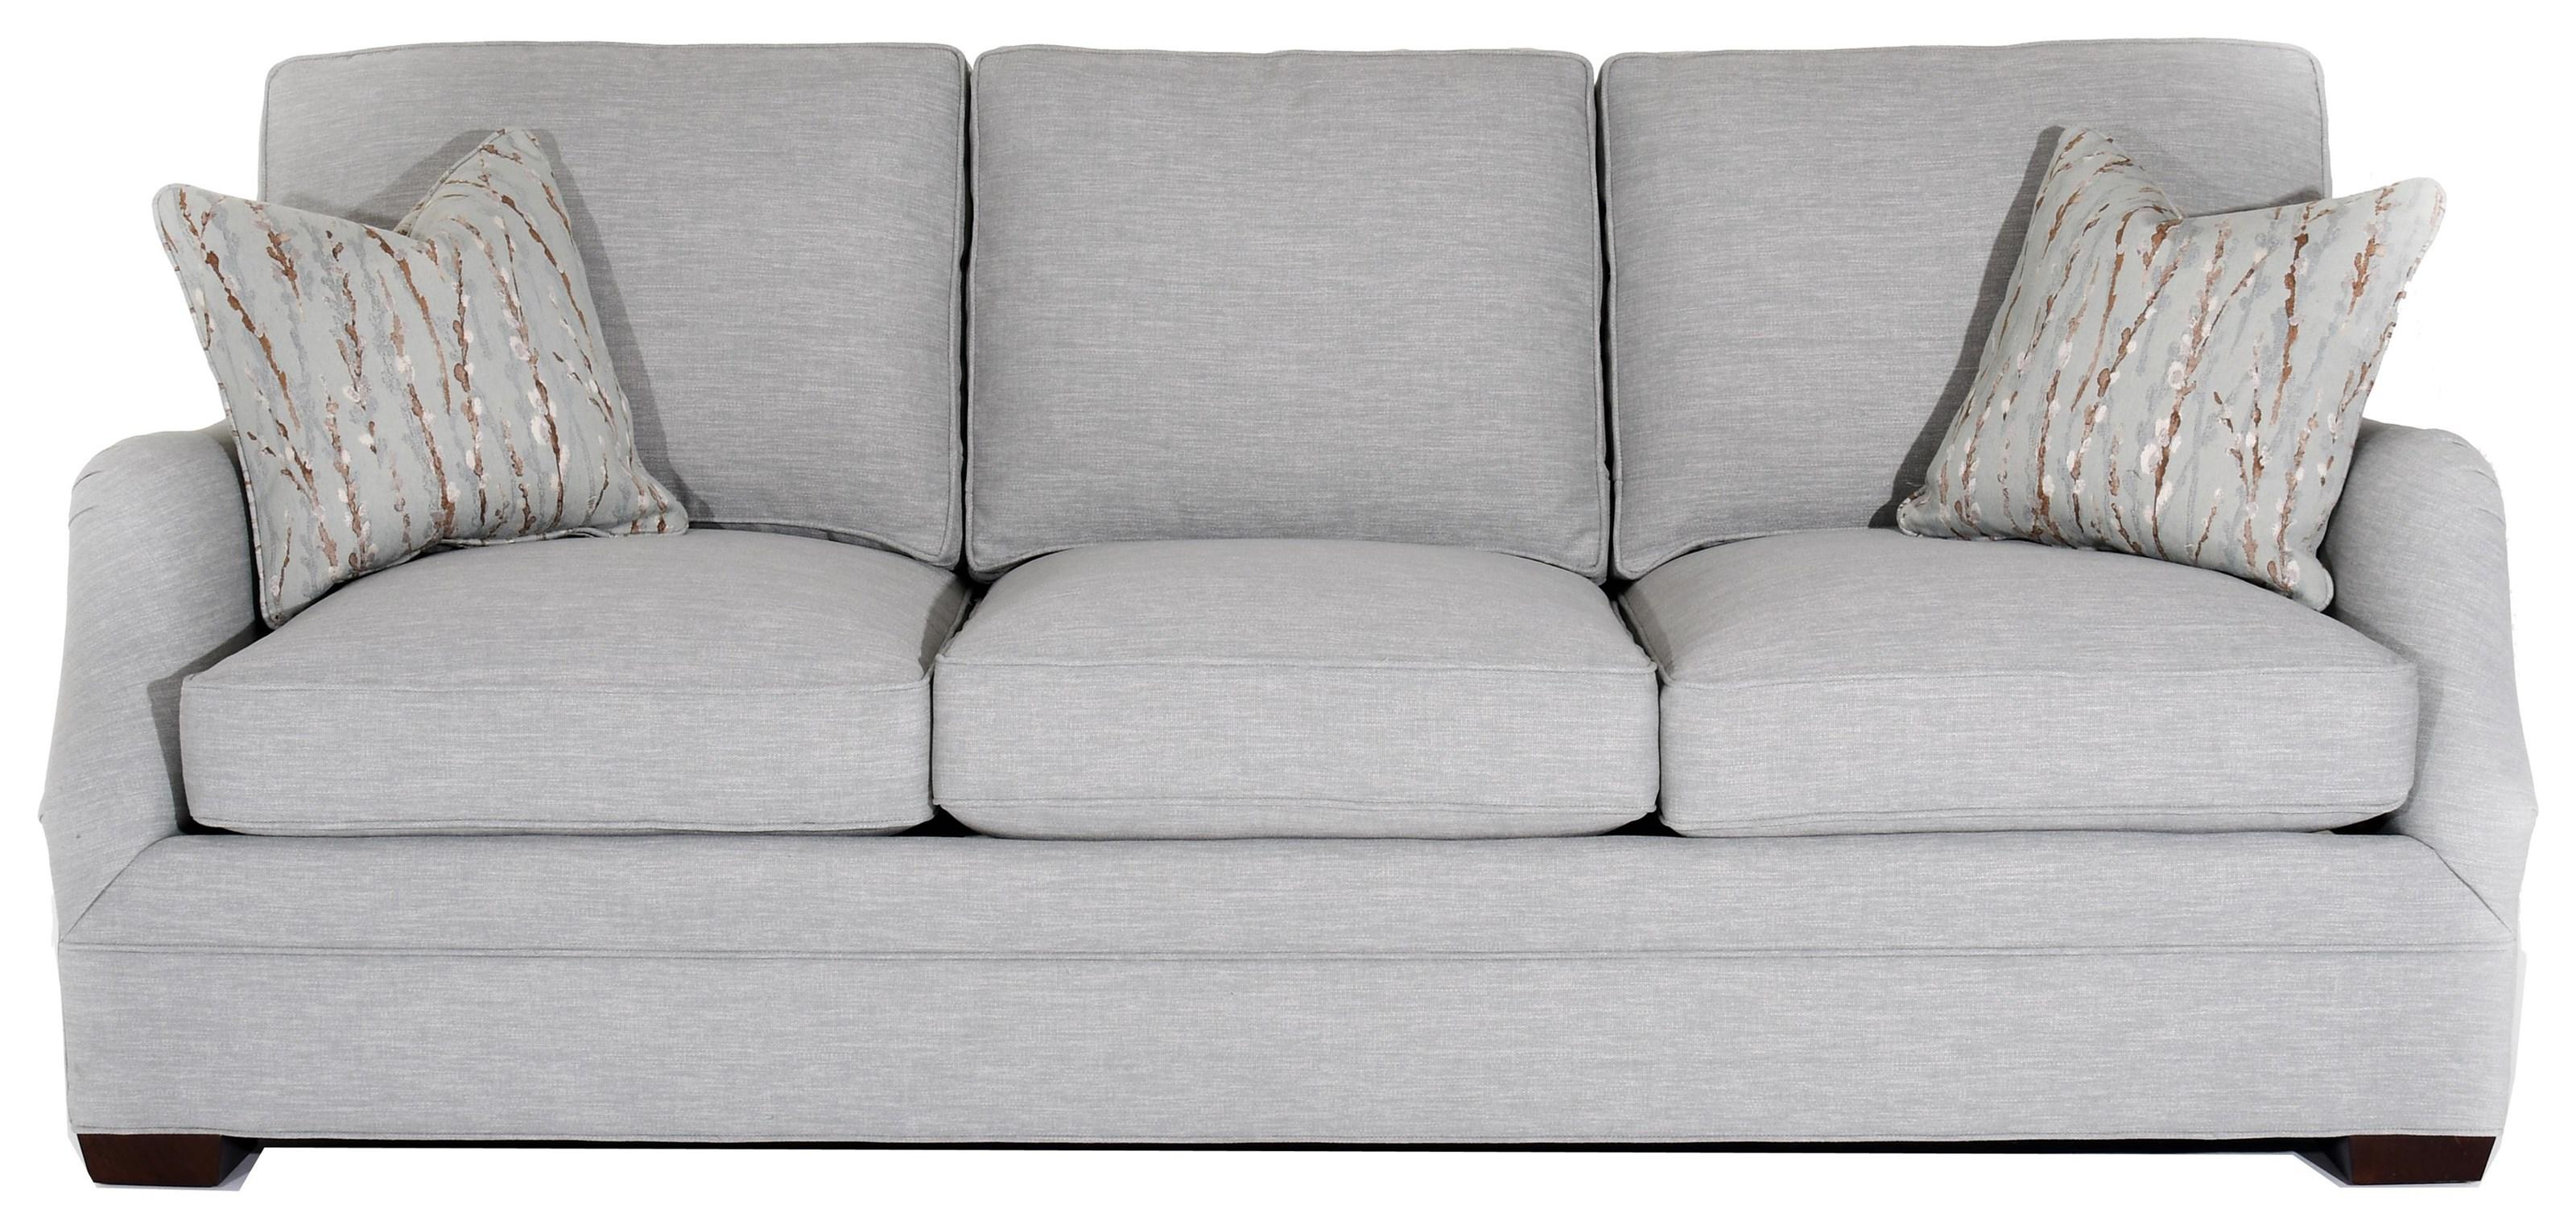 Sherrill Design Your Own Customizable Sofa - Item Number: 9634-EFBL LARGO BLU